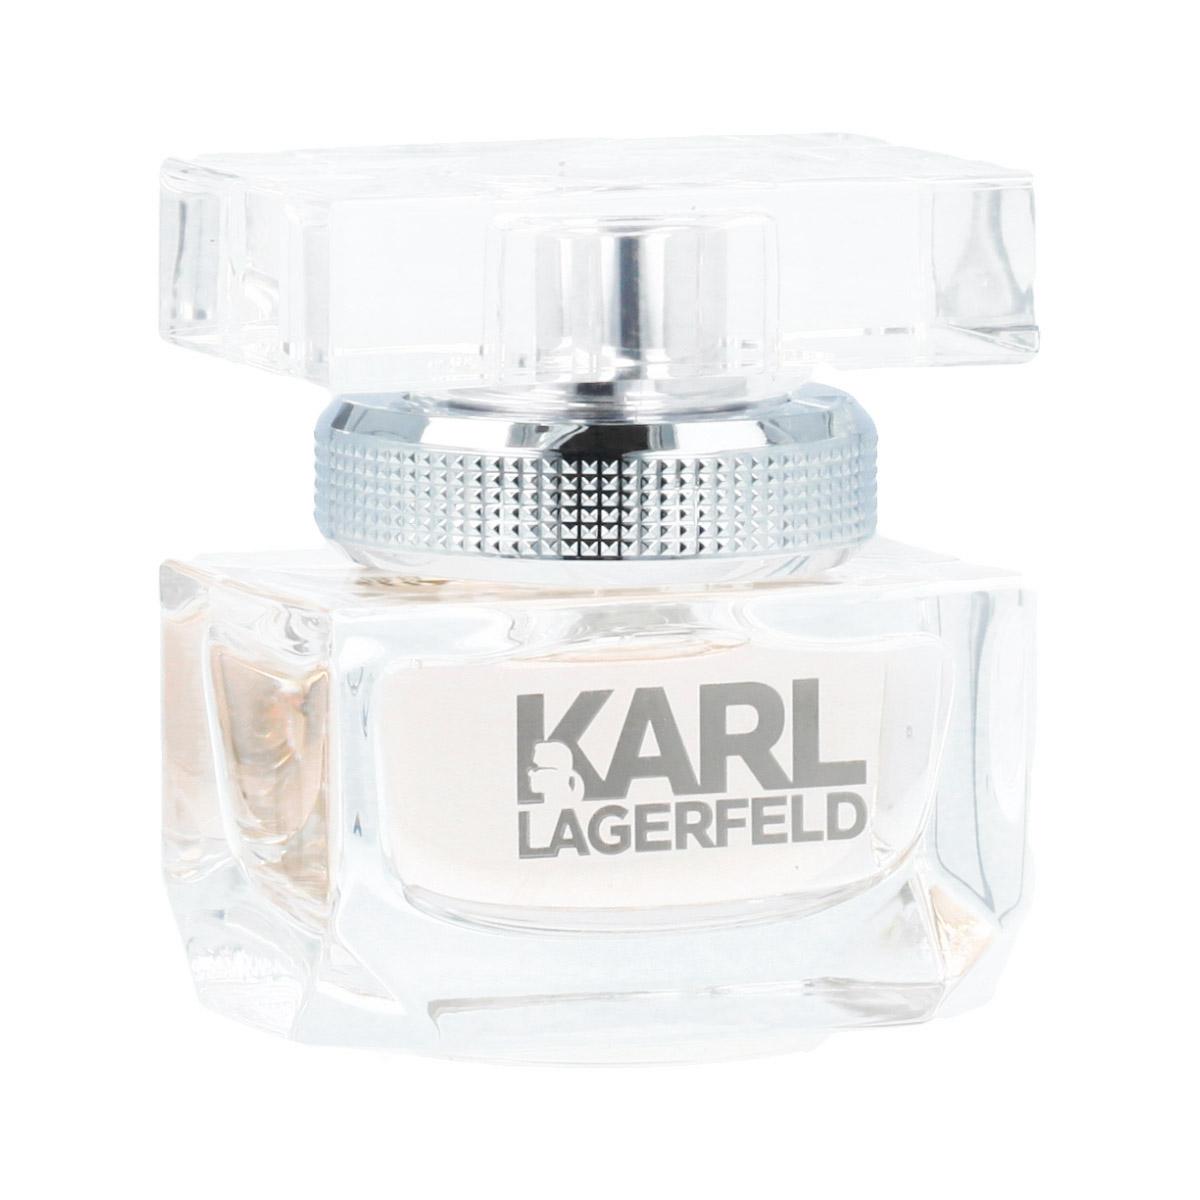 Karl Lagerfeld Karl Lagerfeld for Her Eau De Parfum 25 ml (woman) 76220